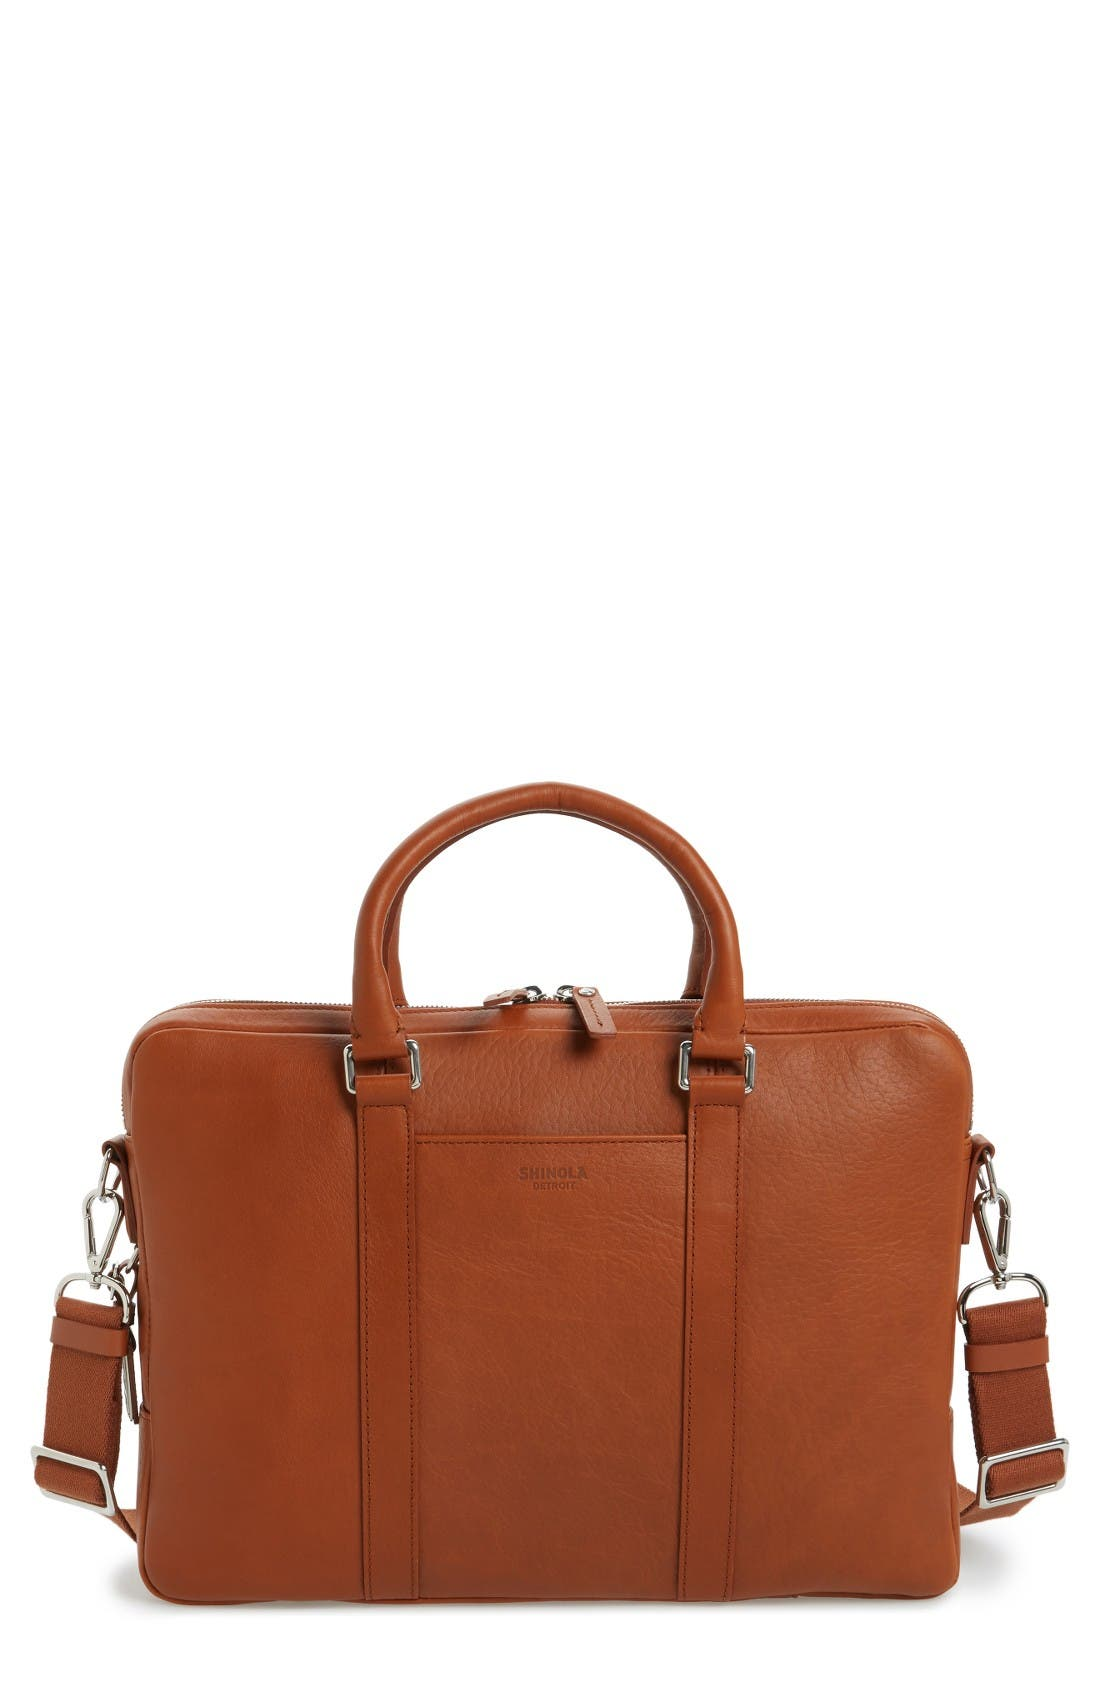 SHINOLA Signature Leather Briefcase